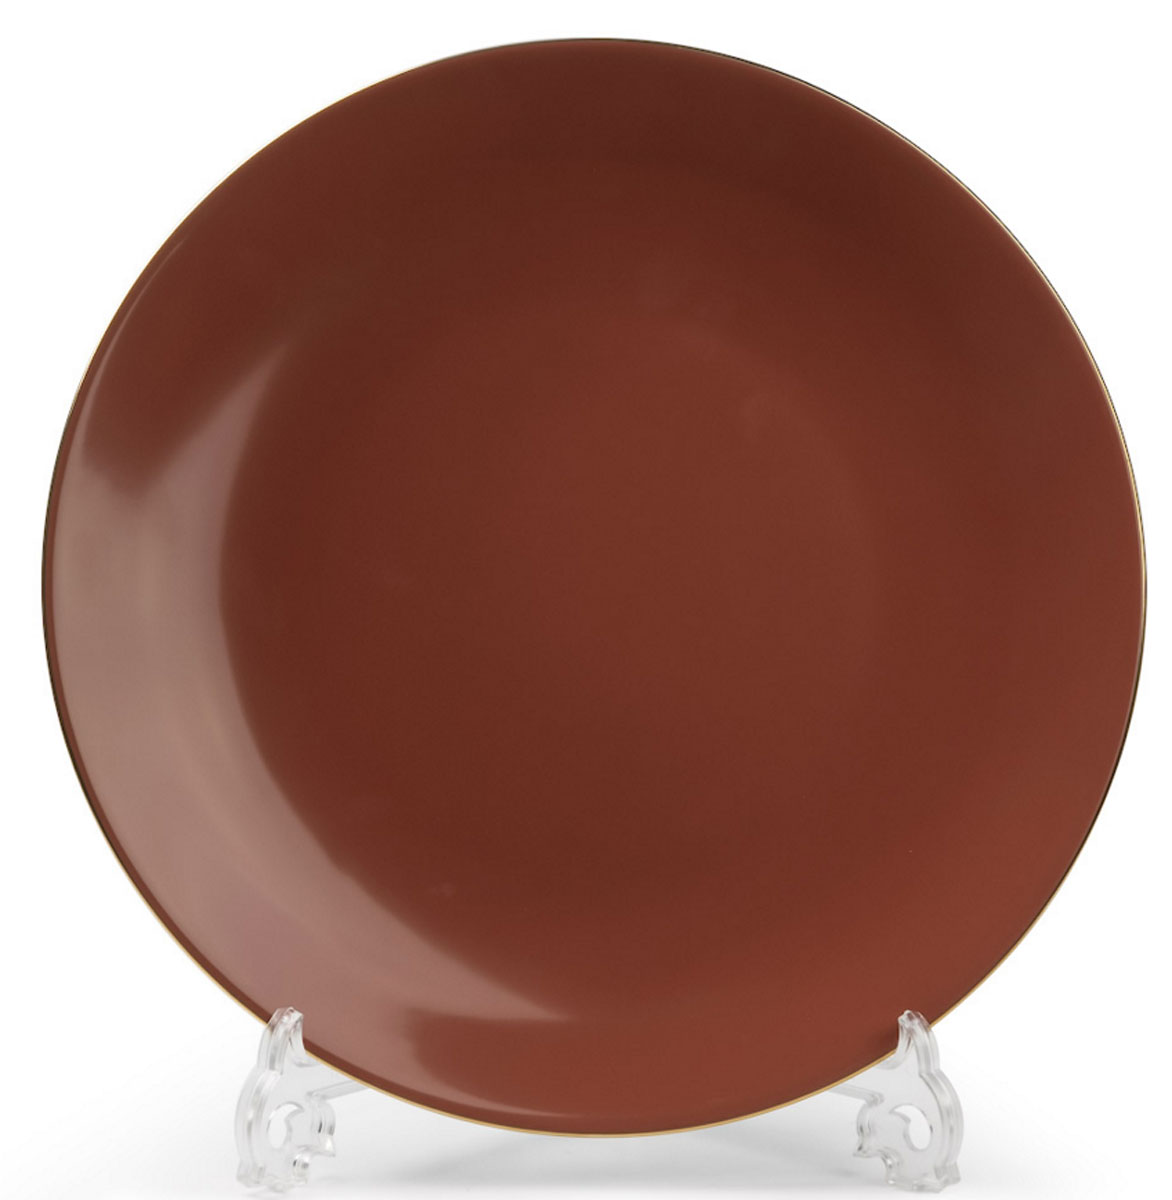 Monalisa 3126 набор тарелок 27 см*6 шт, цвет: мокко с золотом54 009312В наборе тарелка 27 см 6 штук Материал: фарфор: цвет: мокко с золотомСерия: MONALISA